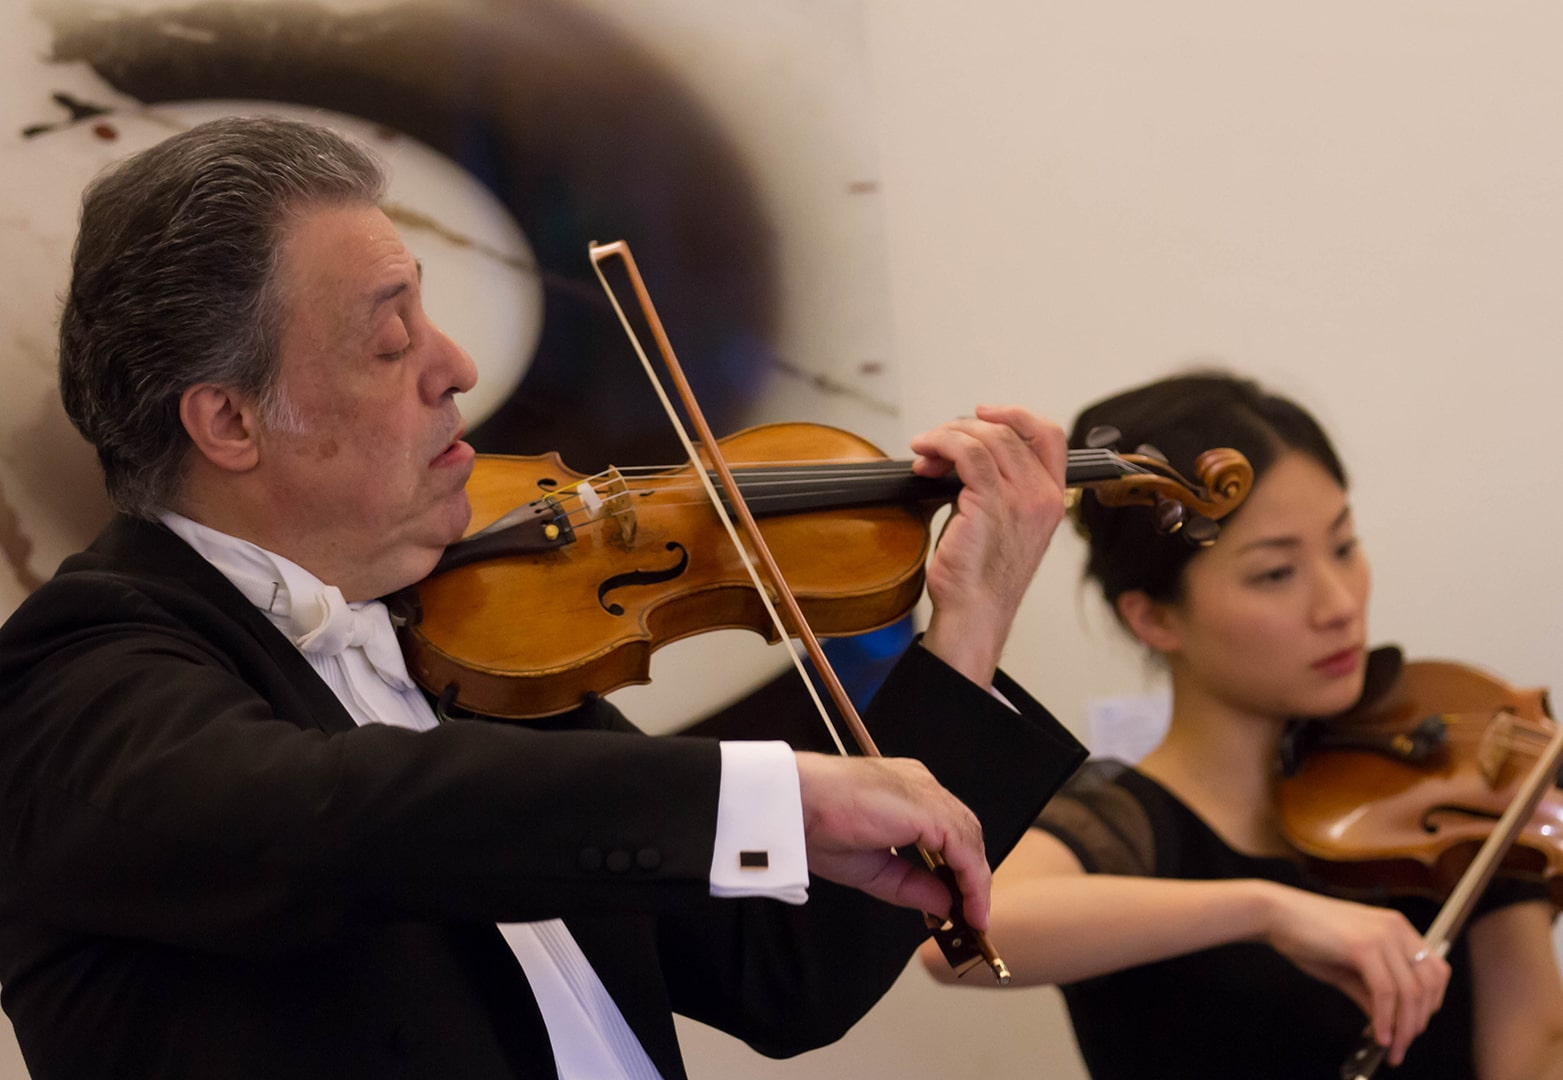 Orchestre de Chambre Kayaleh - Kayaleh Chamber Orchestra - Centre de Musique Kayaleh